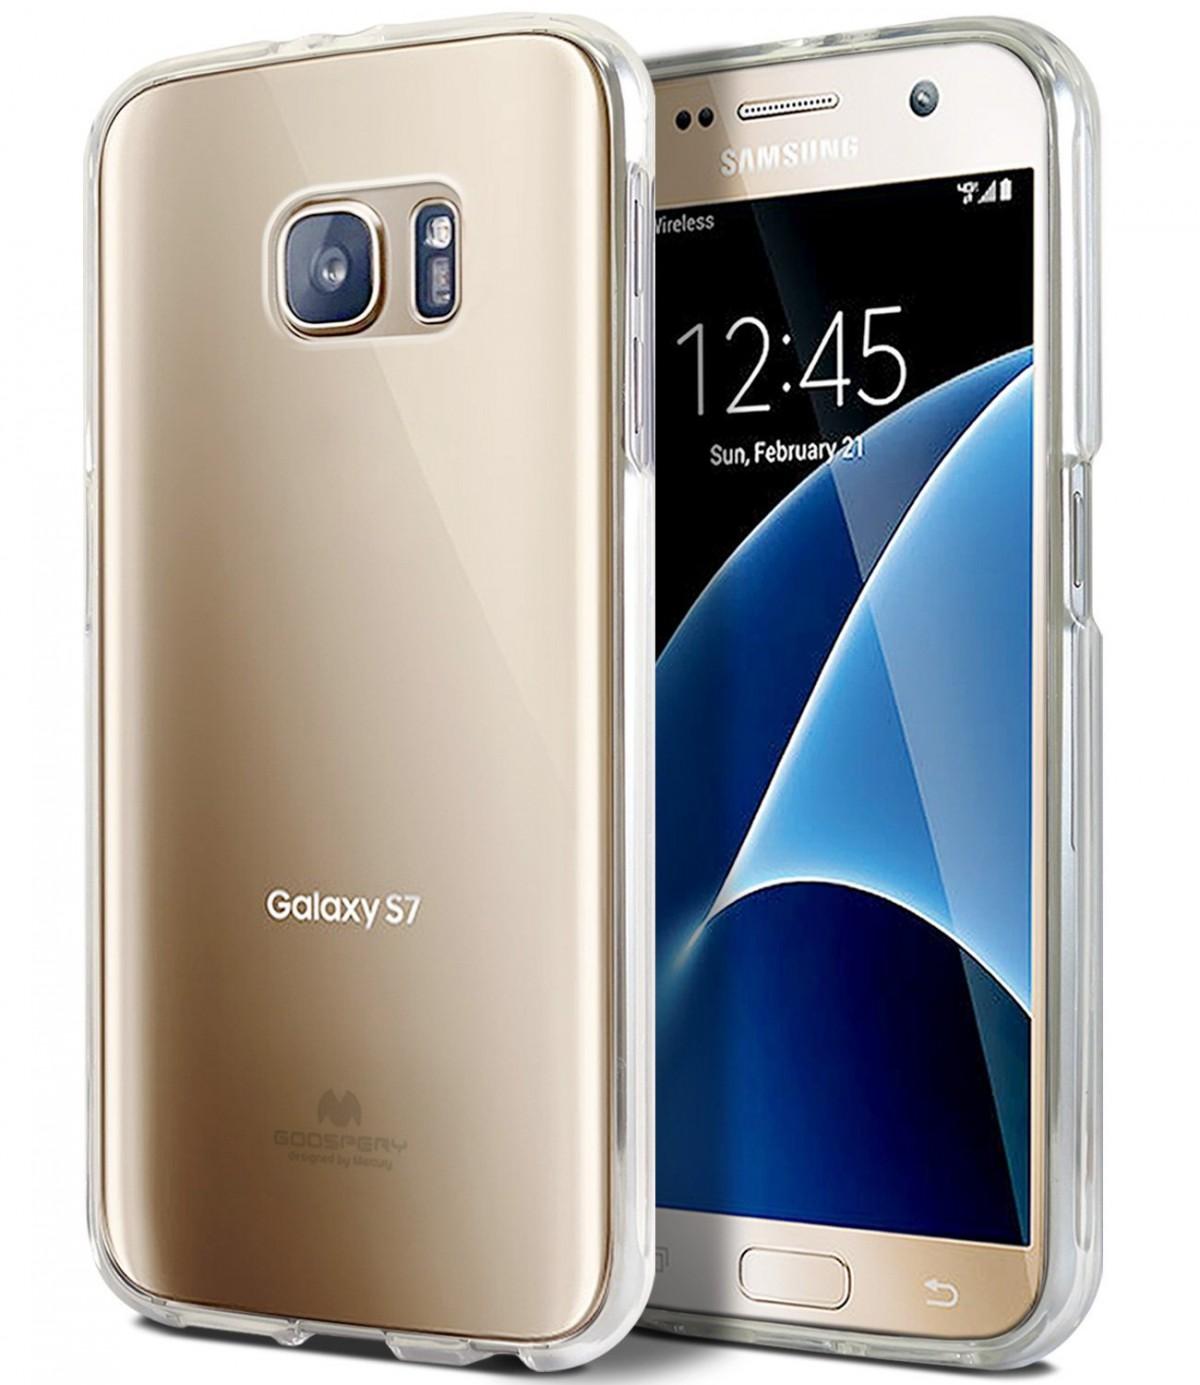 Silikonový obal / kryt Goospery Mercury pro Samsung Galaxy S7, čirý